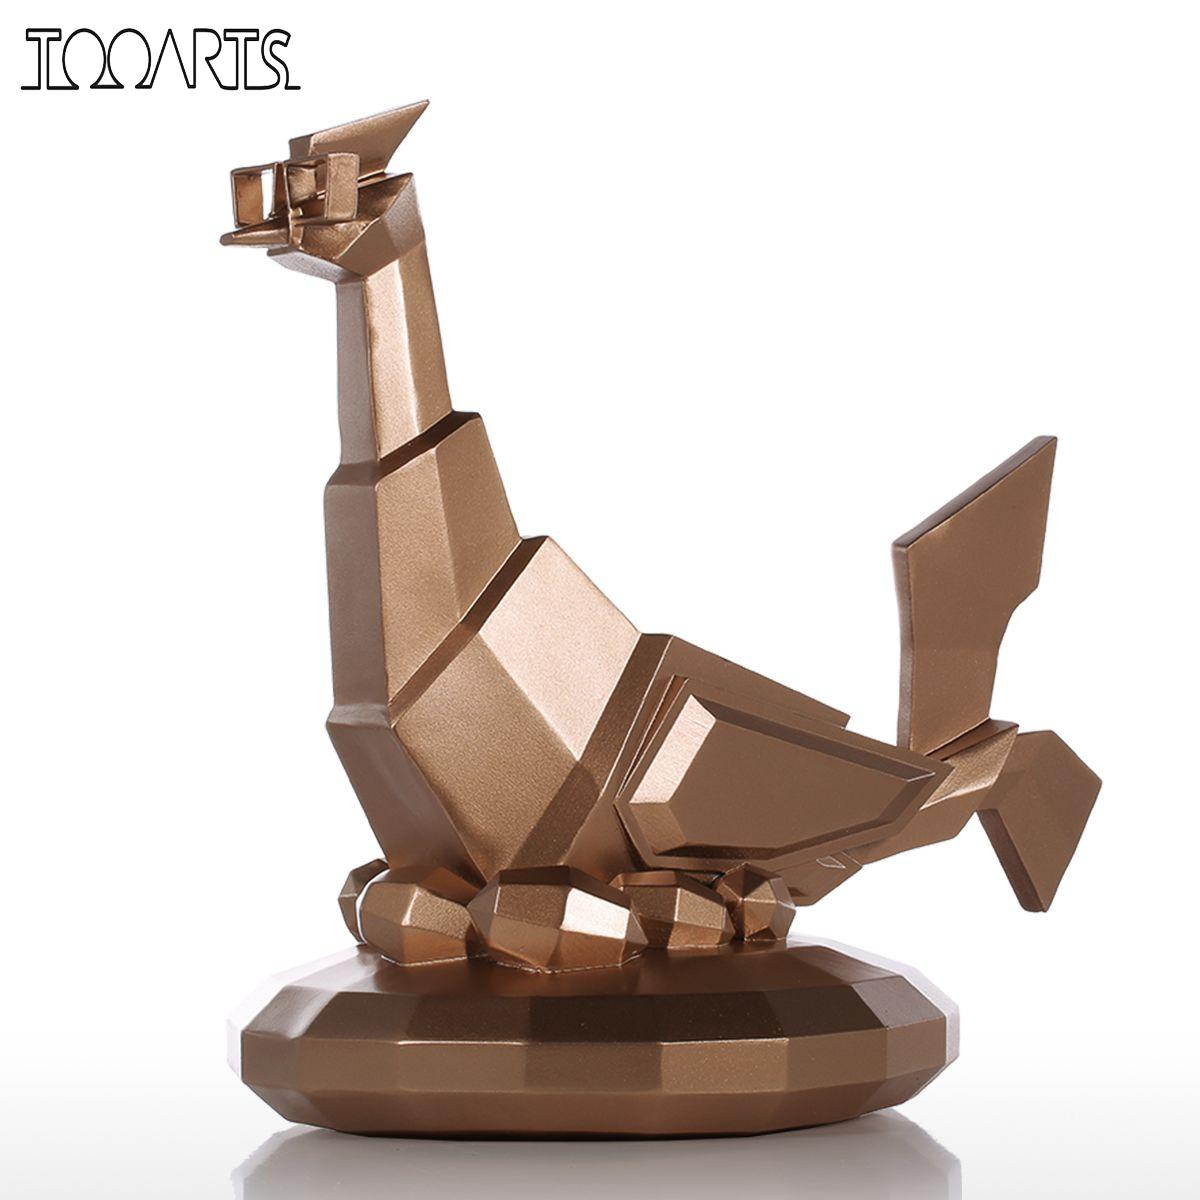 tooarts modern sculpture glasses chicken resin sculpture home decor modern art figurine animal. Black Bedroom Furniture Sets. Home Design Ideas